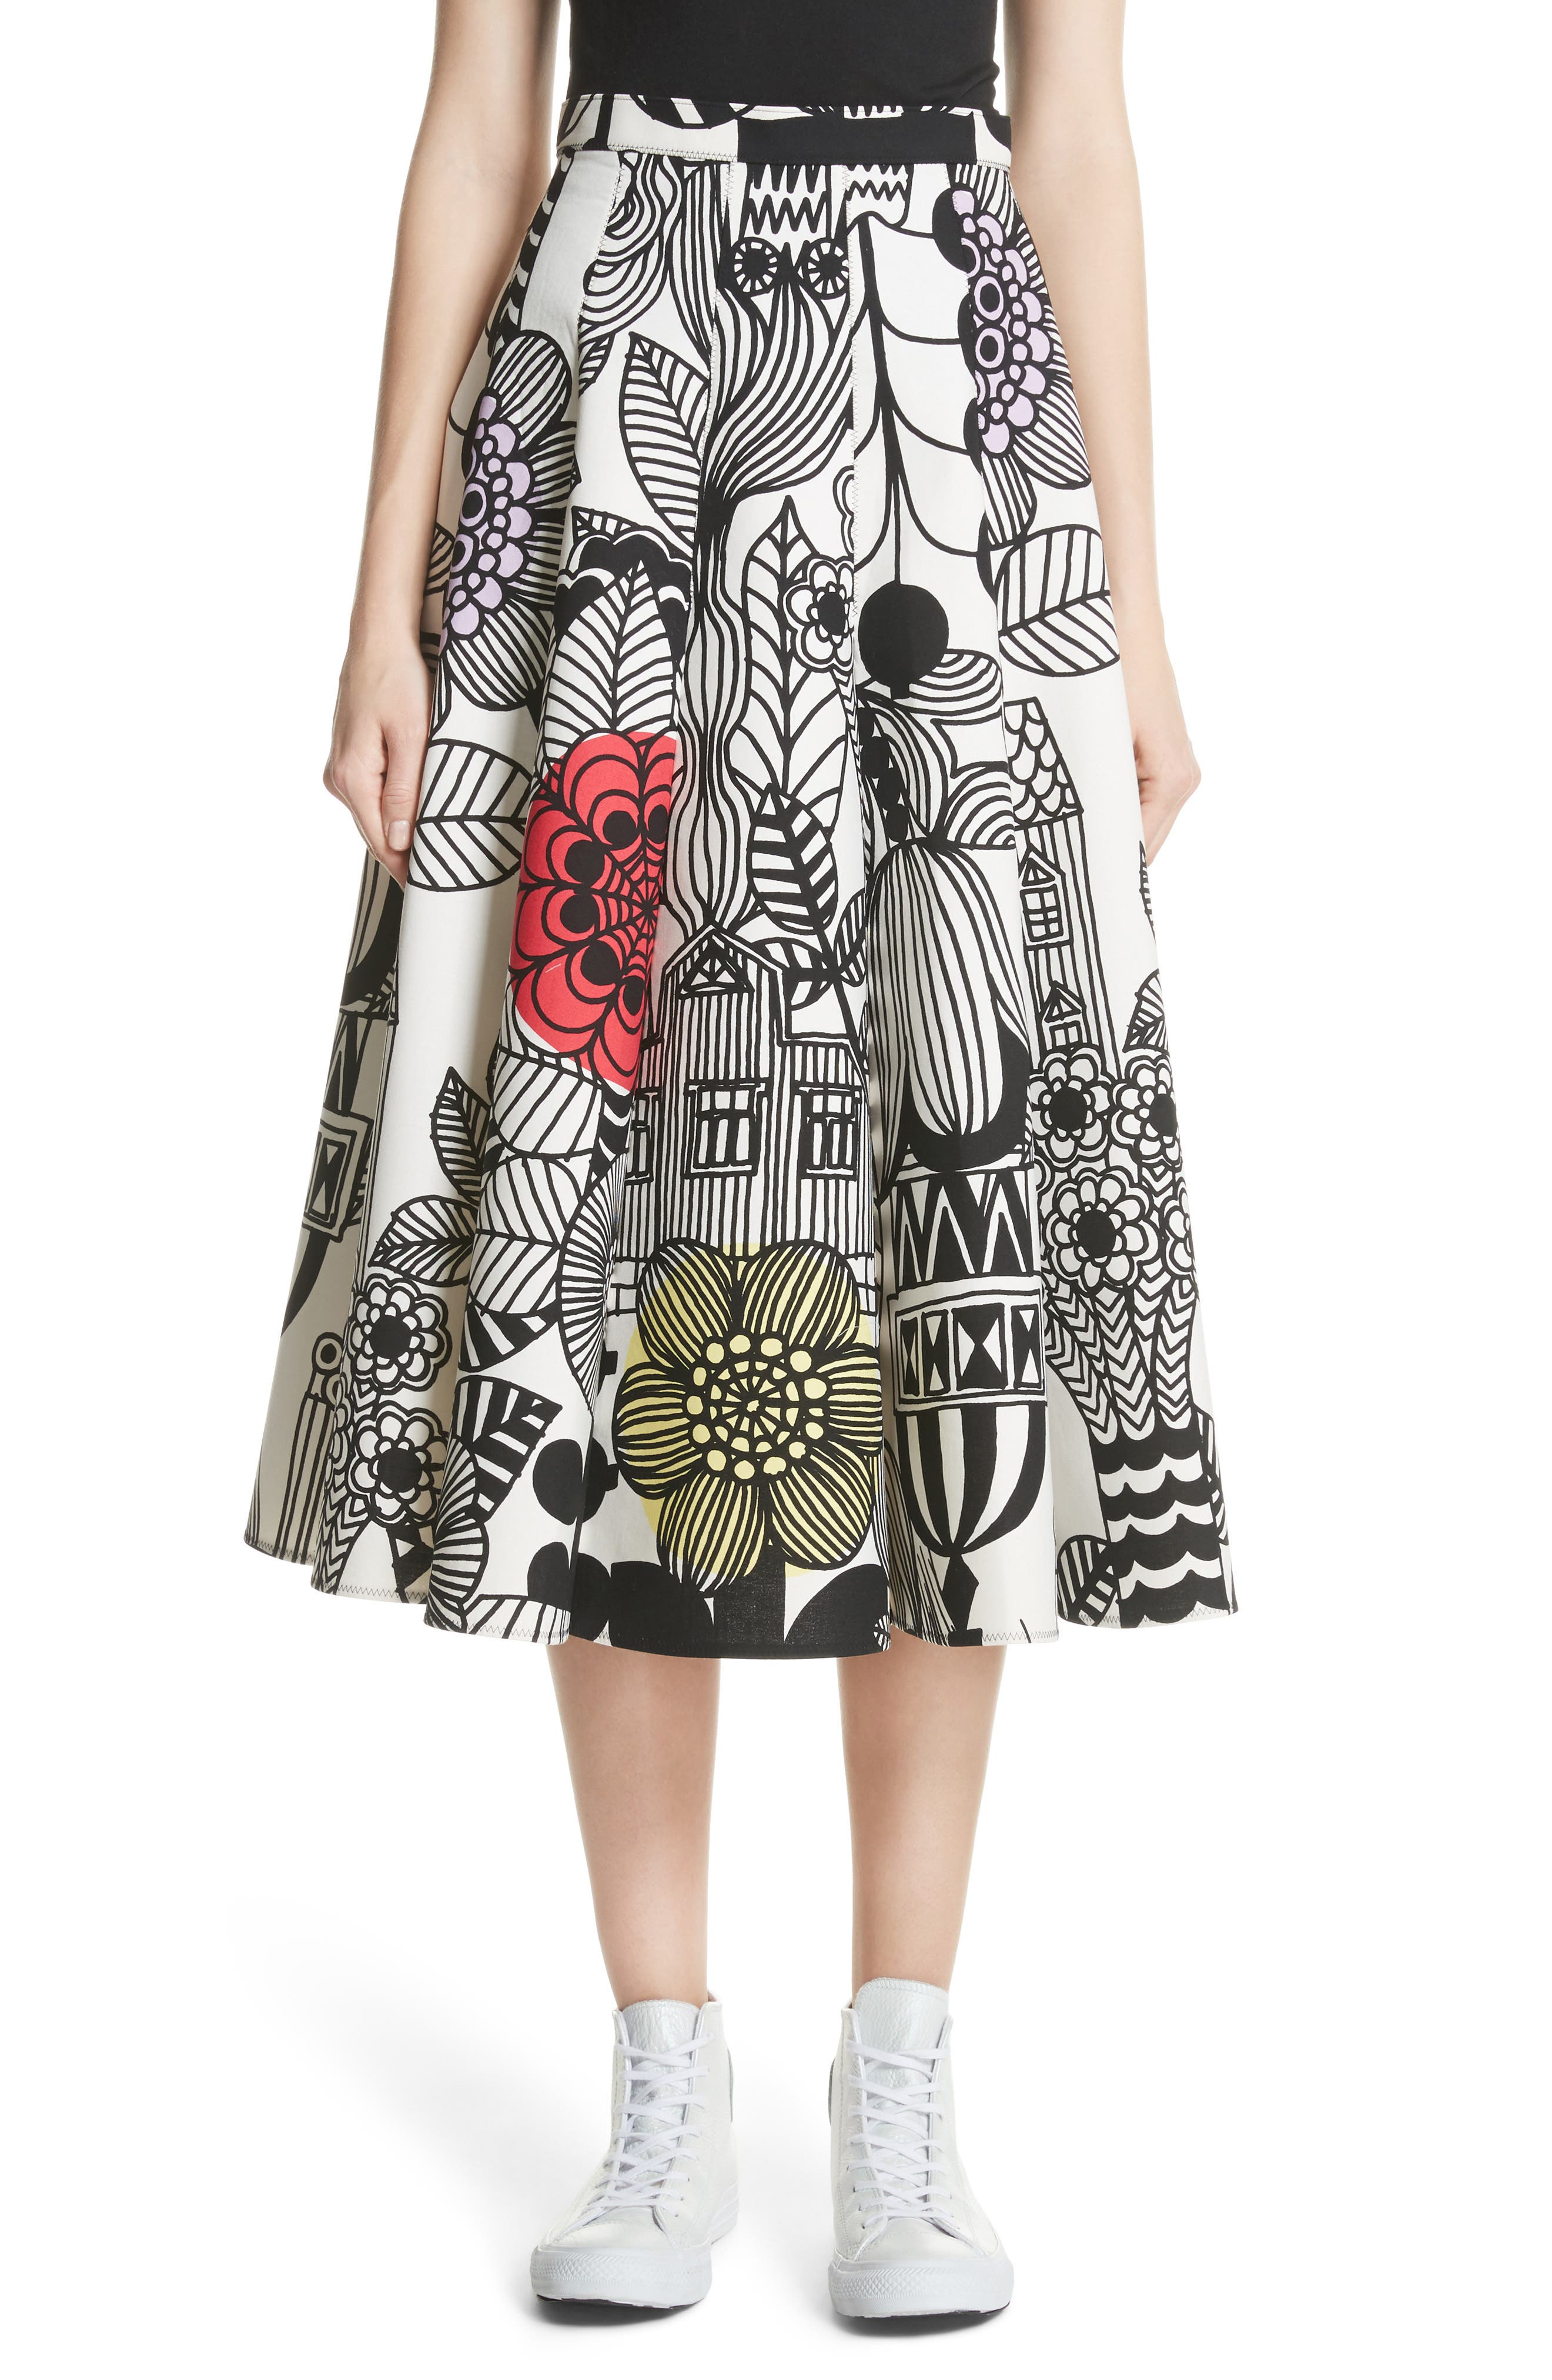 x Marimekko Vegetable Print Cotton Skirt,                             Main thumbnail 1, color,                             Wht/ Blk/ Ylw